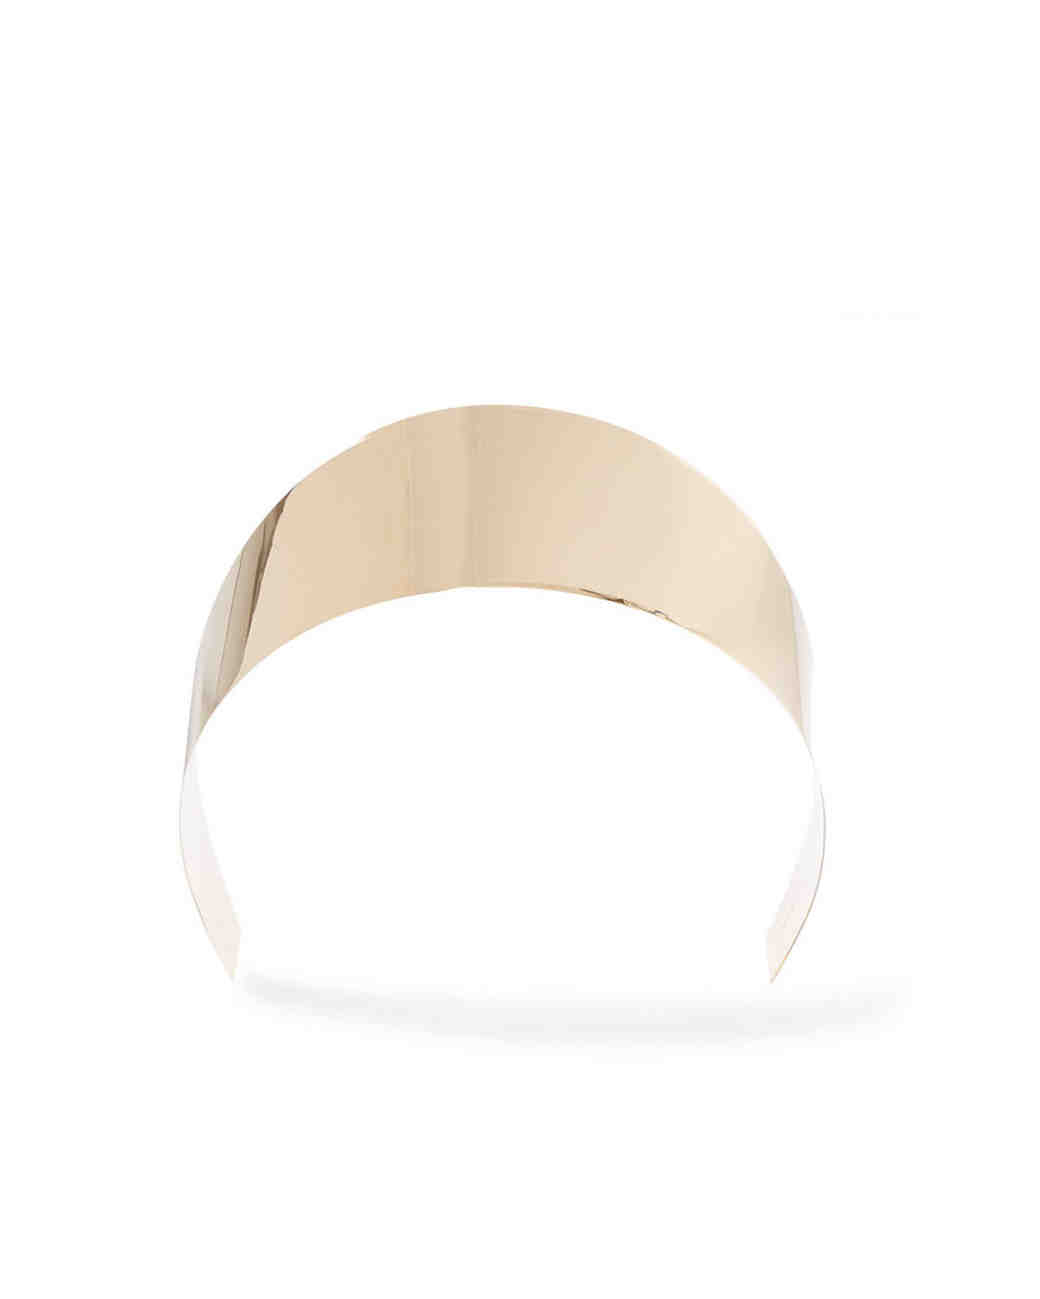 Flower crown alternatives Givenchy gold headband